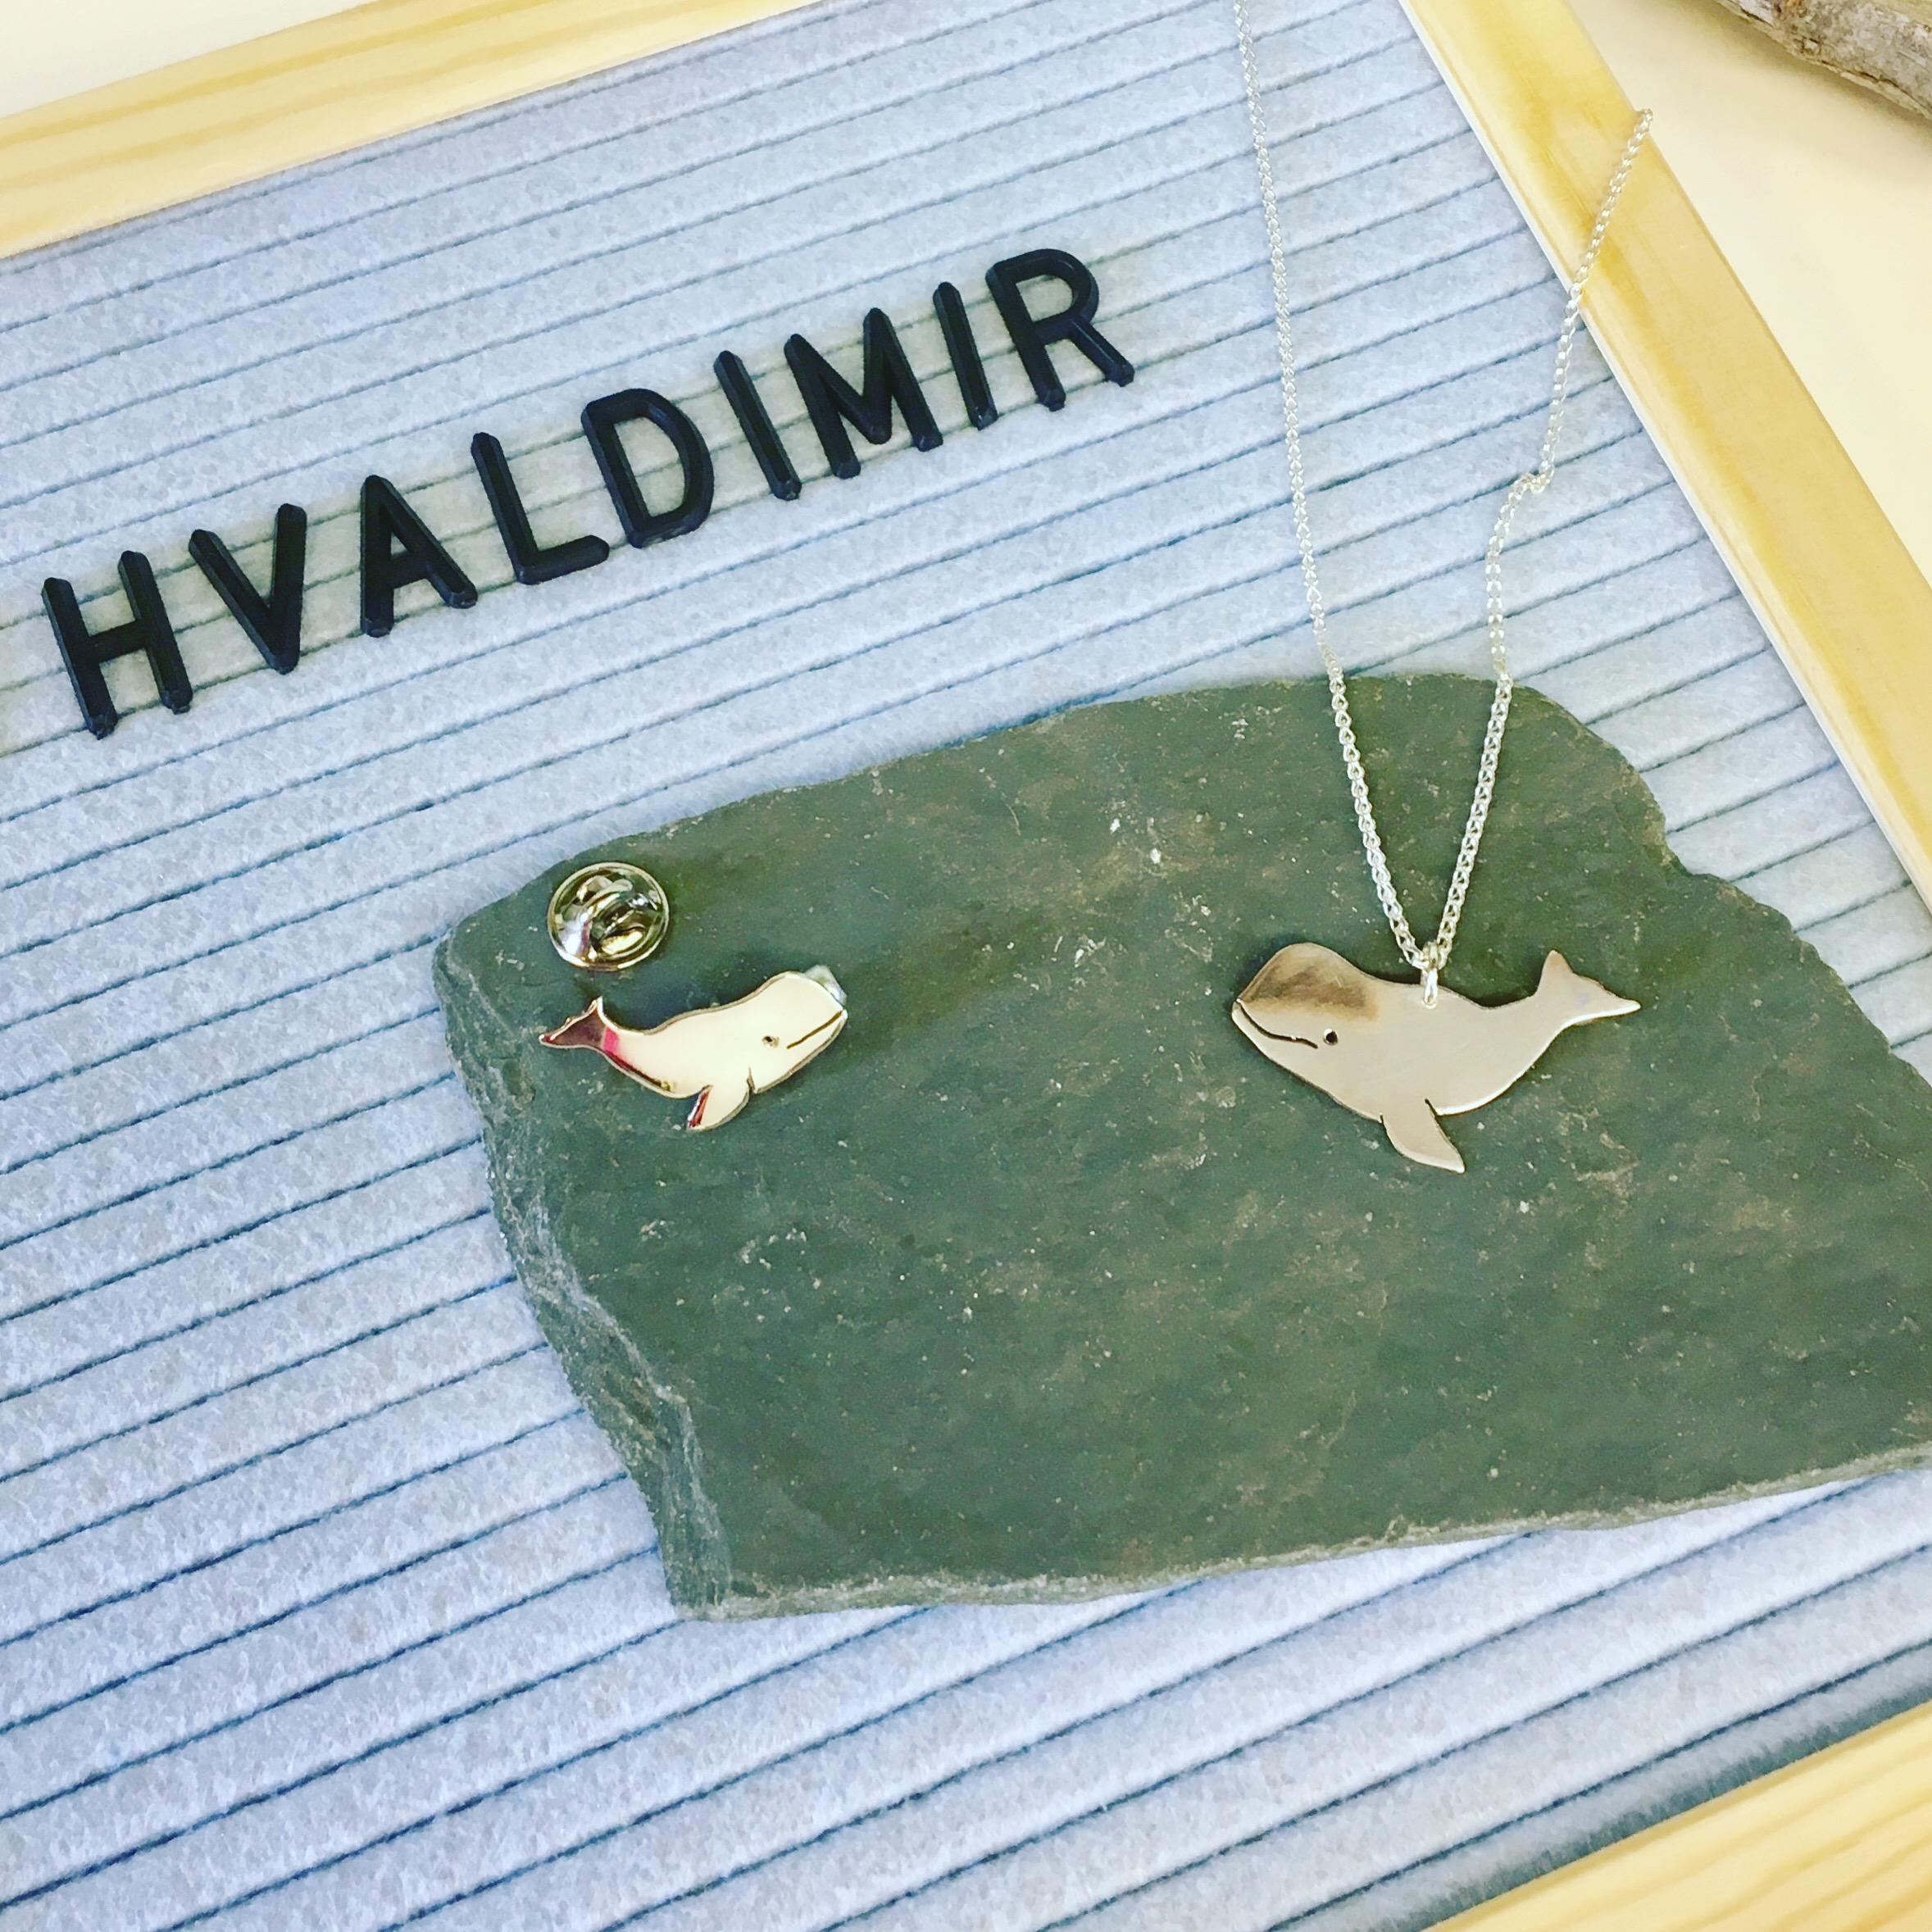 Hvaldimir, the white beluga whale